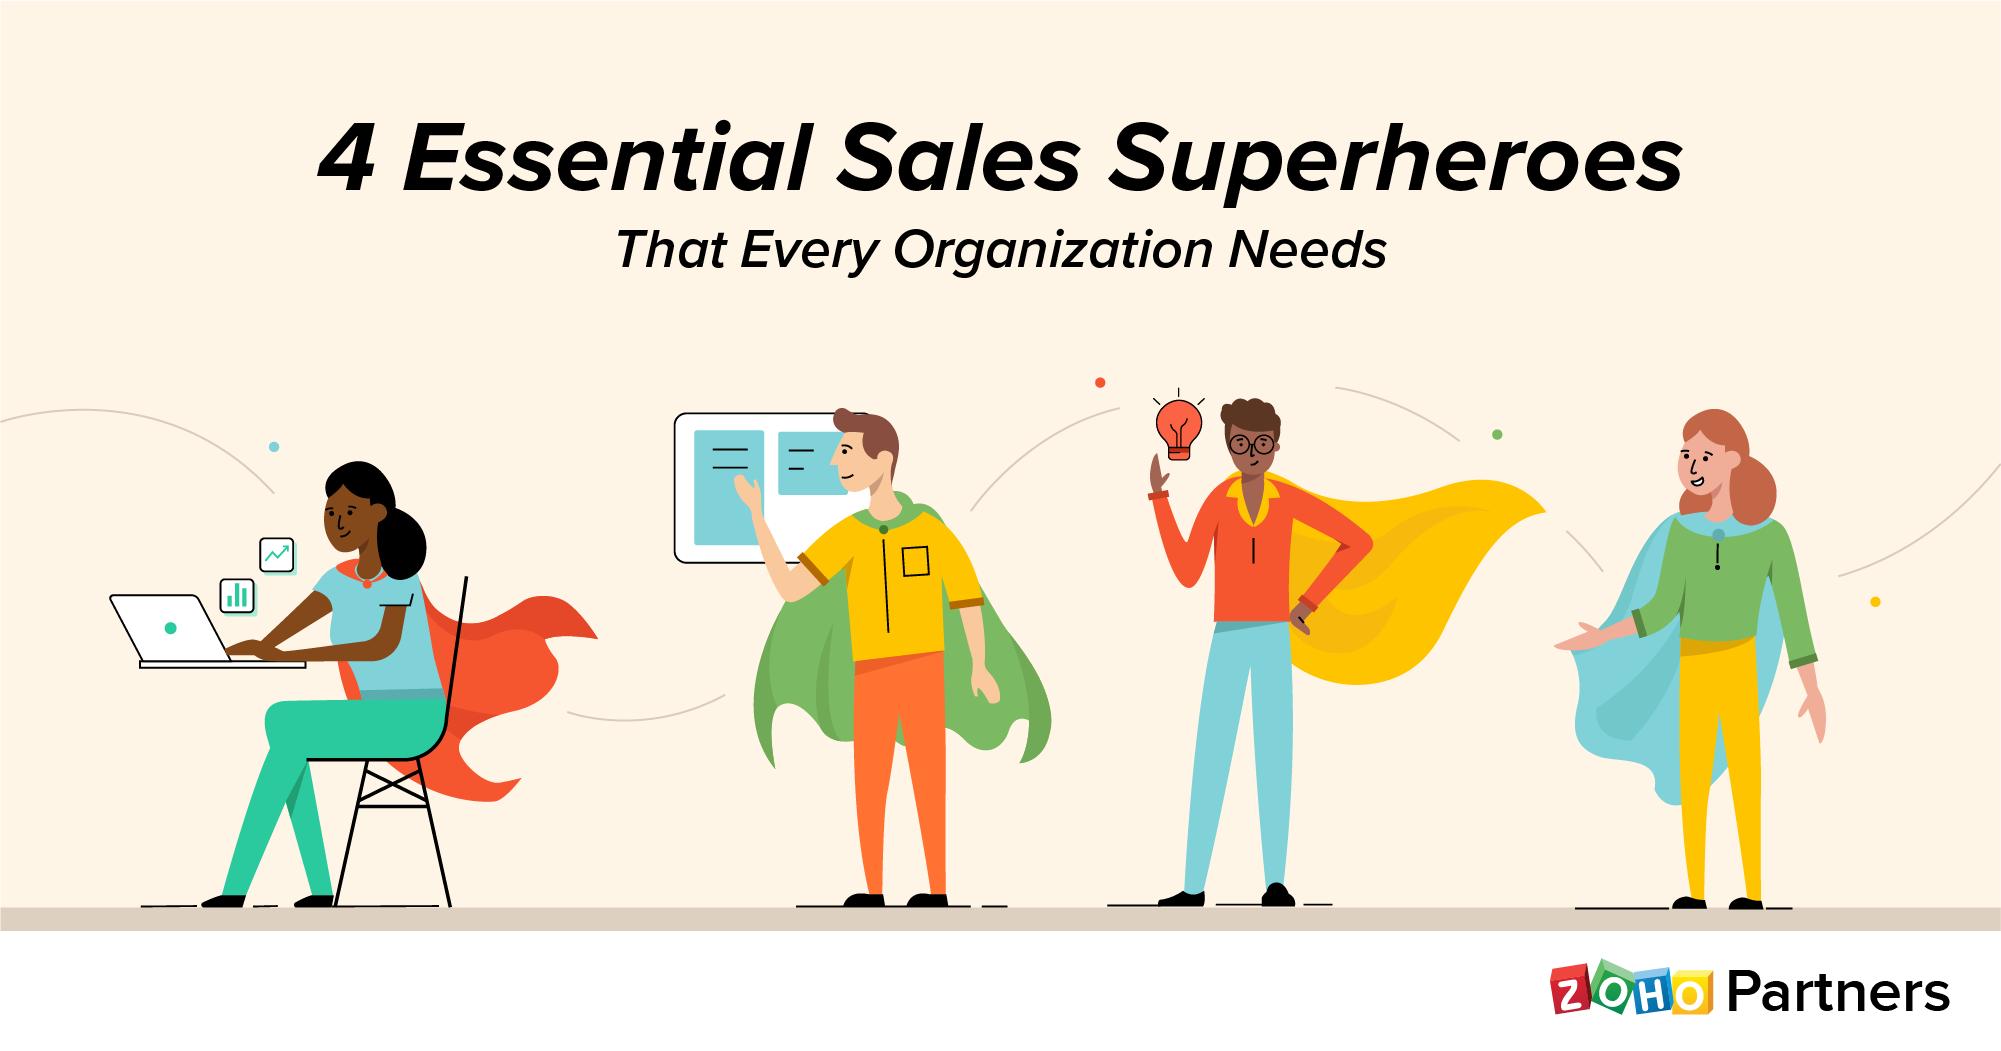 4 Essential sales superheroes that every organization needs